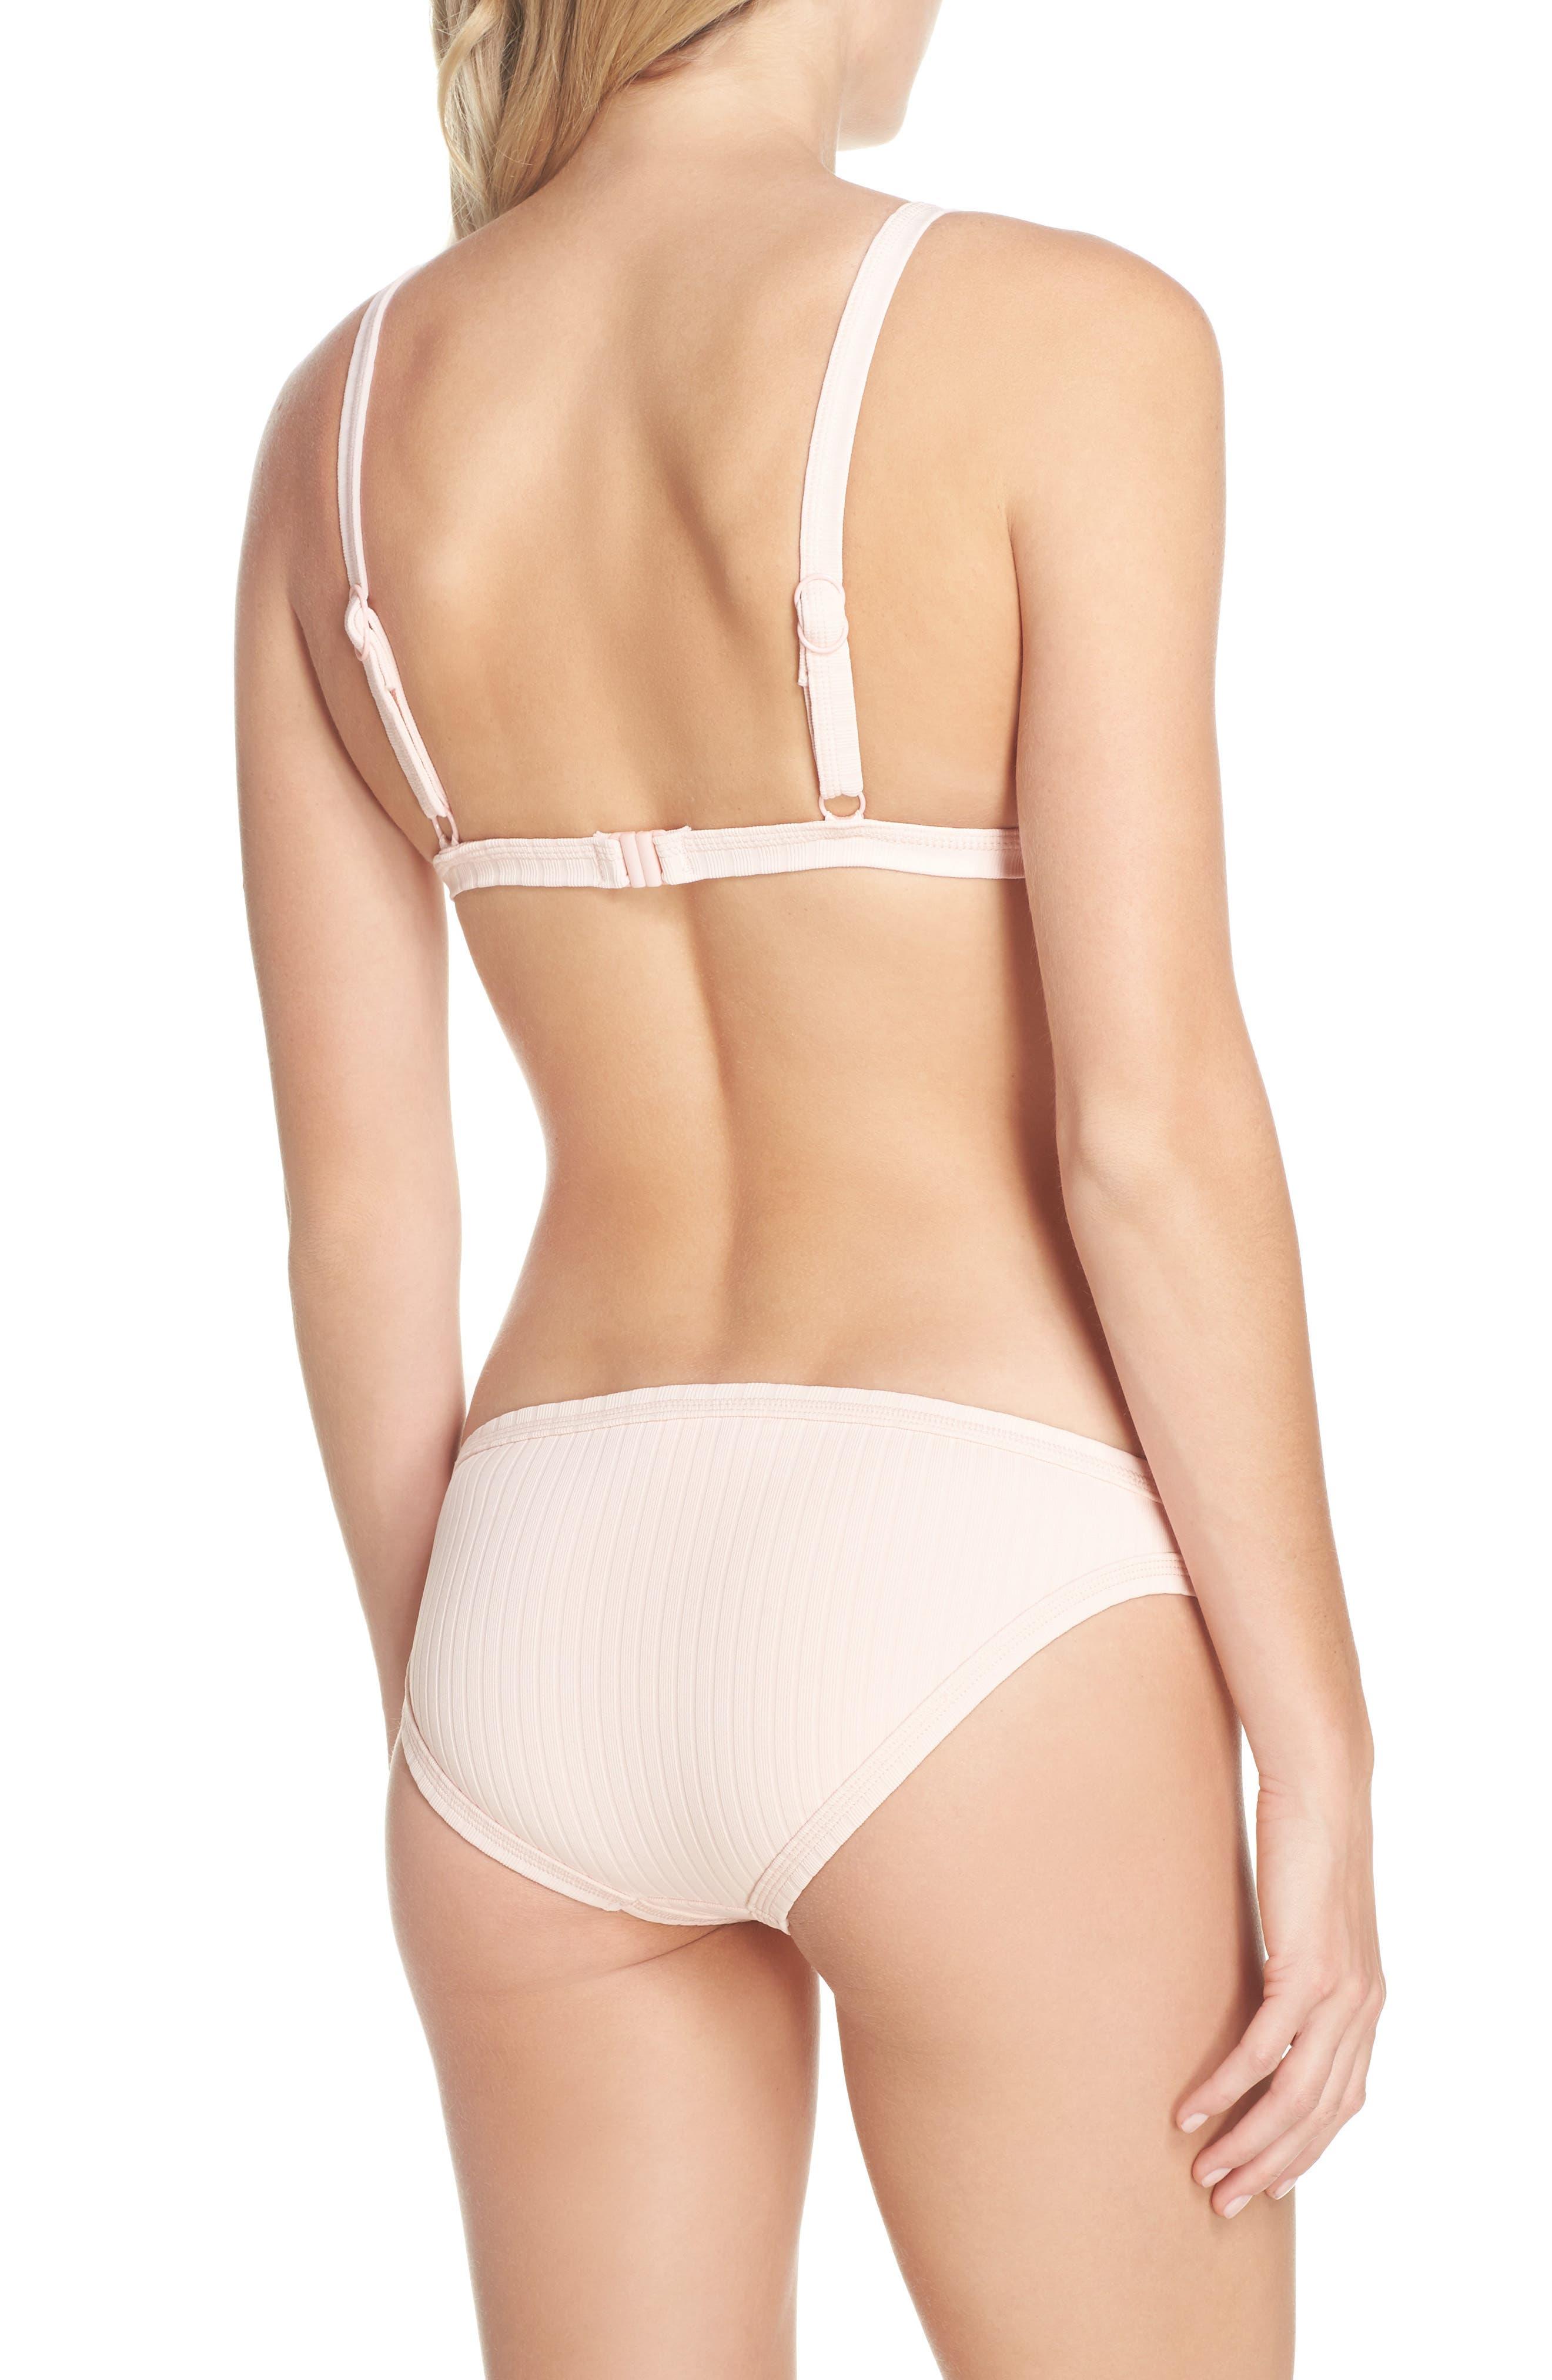 Inka Ribbed Bikini Top,                             Alternate thumbnail 8, color,                             950